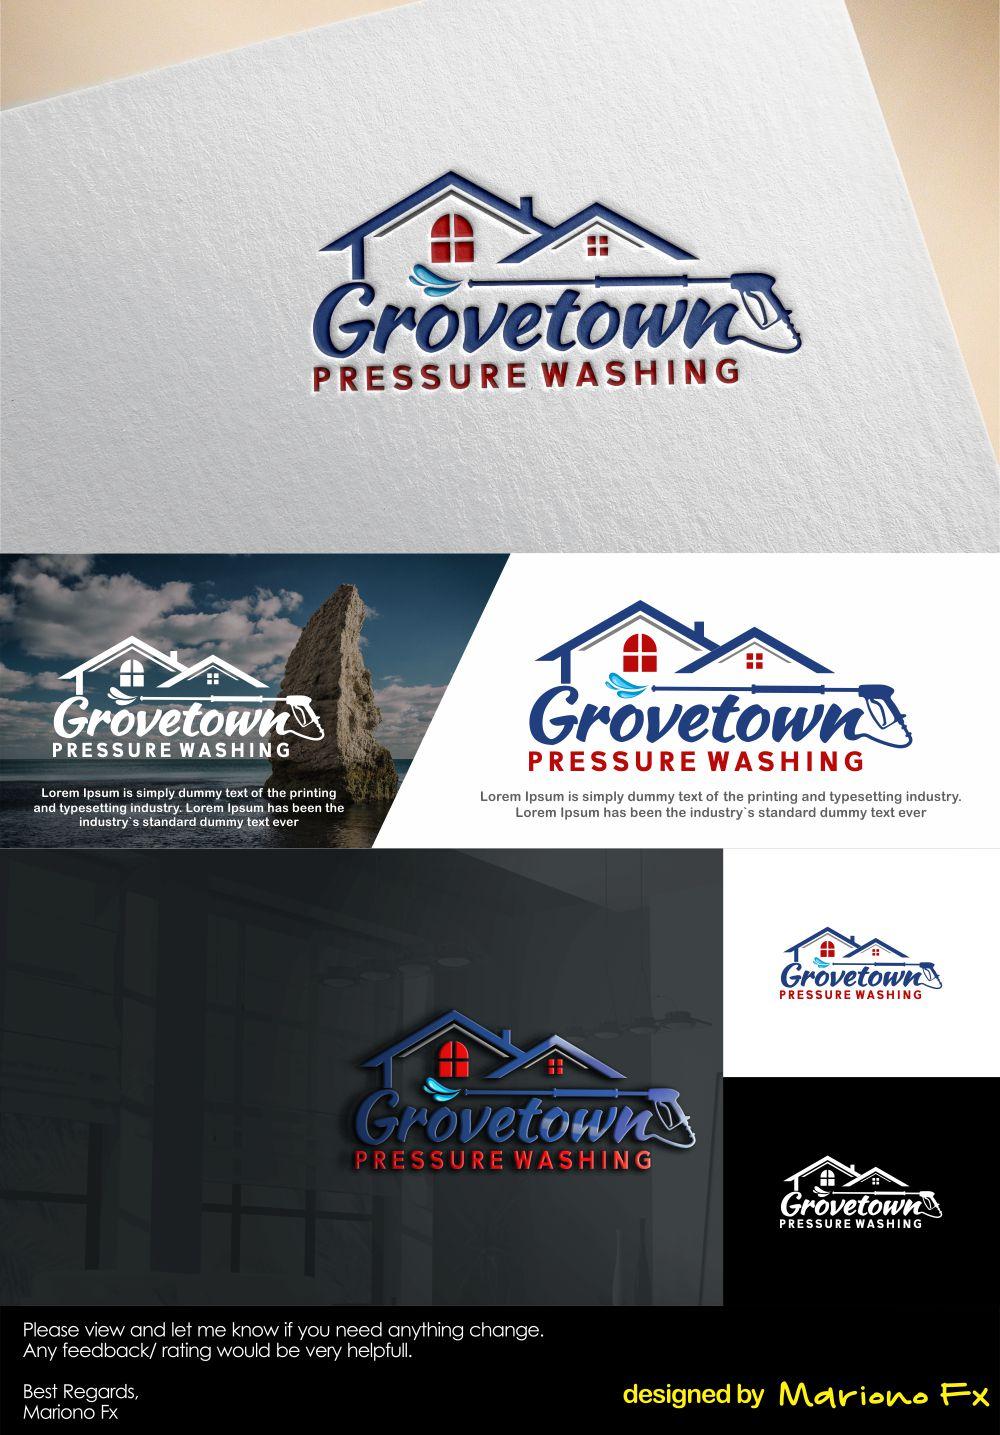 Logo Pressure Washing : pressure, washing, Professional,, Serious,, Pressure, Cleaning, Design, Grovetown, Washing, Mariono, #19895626